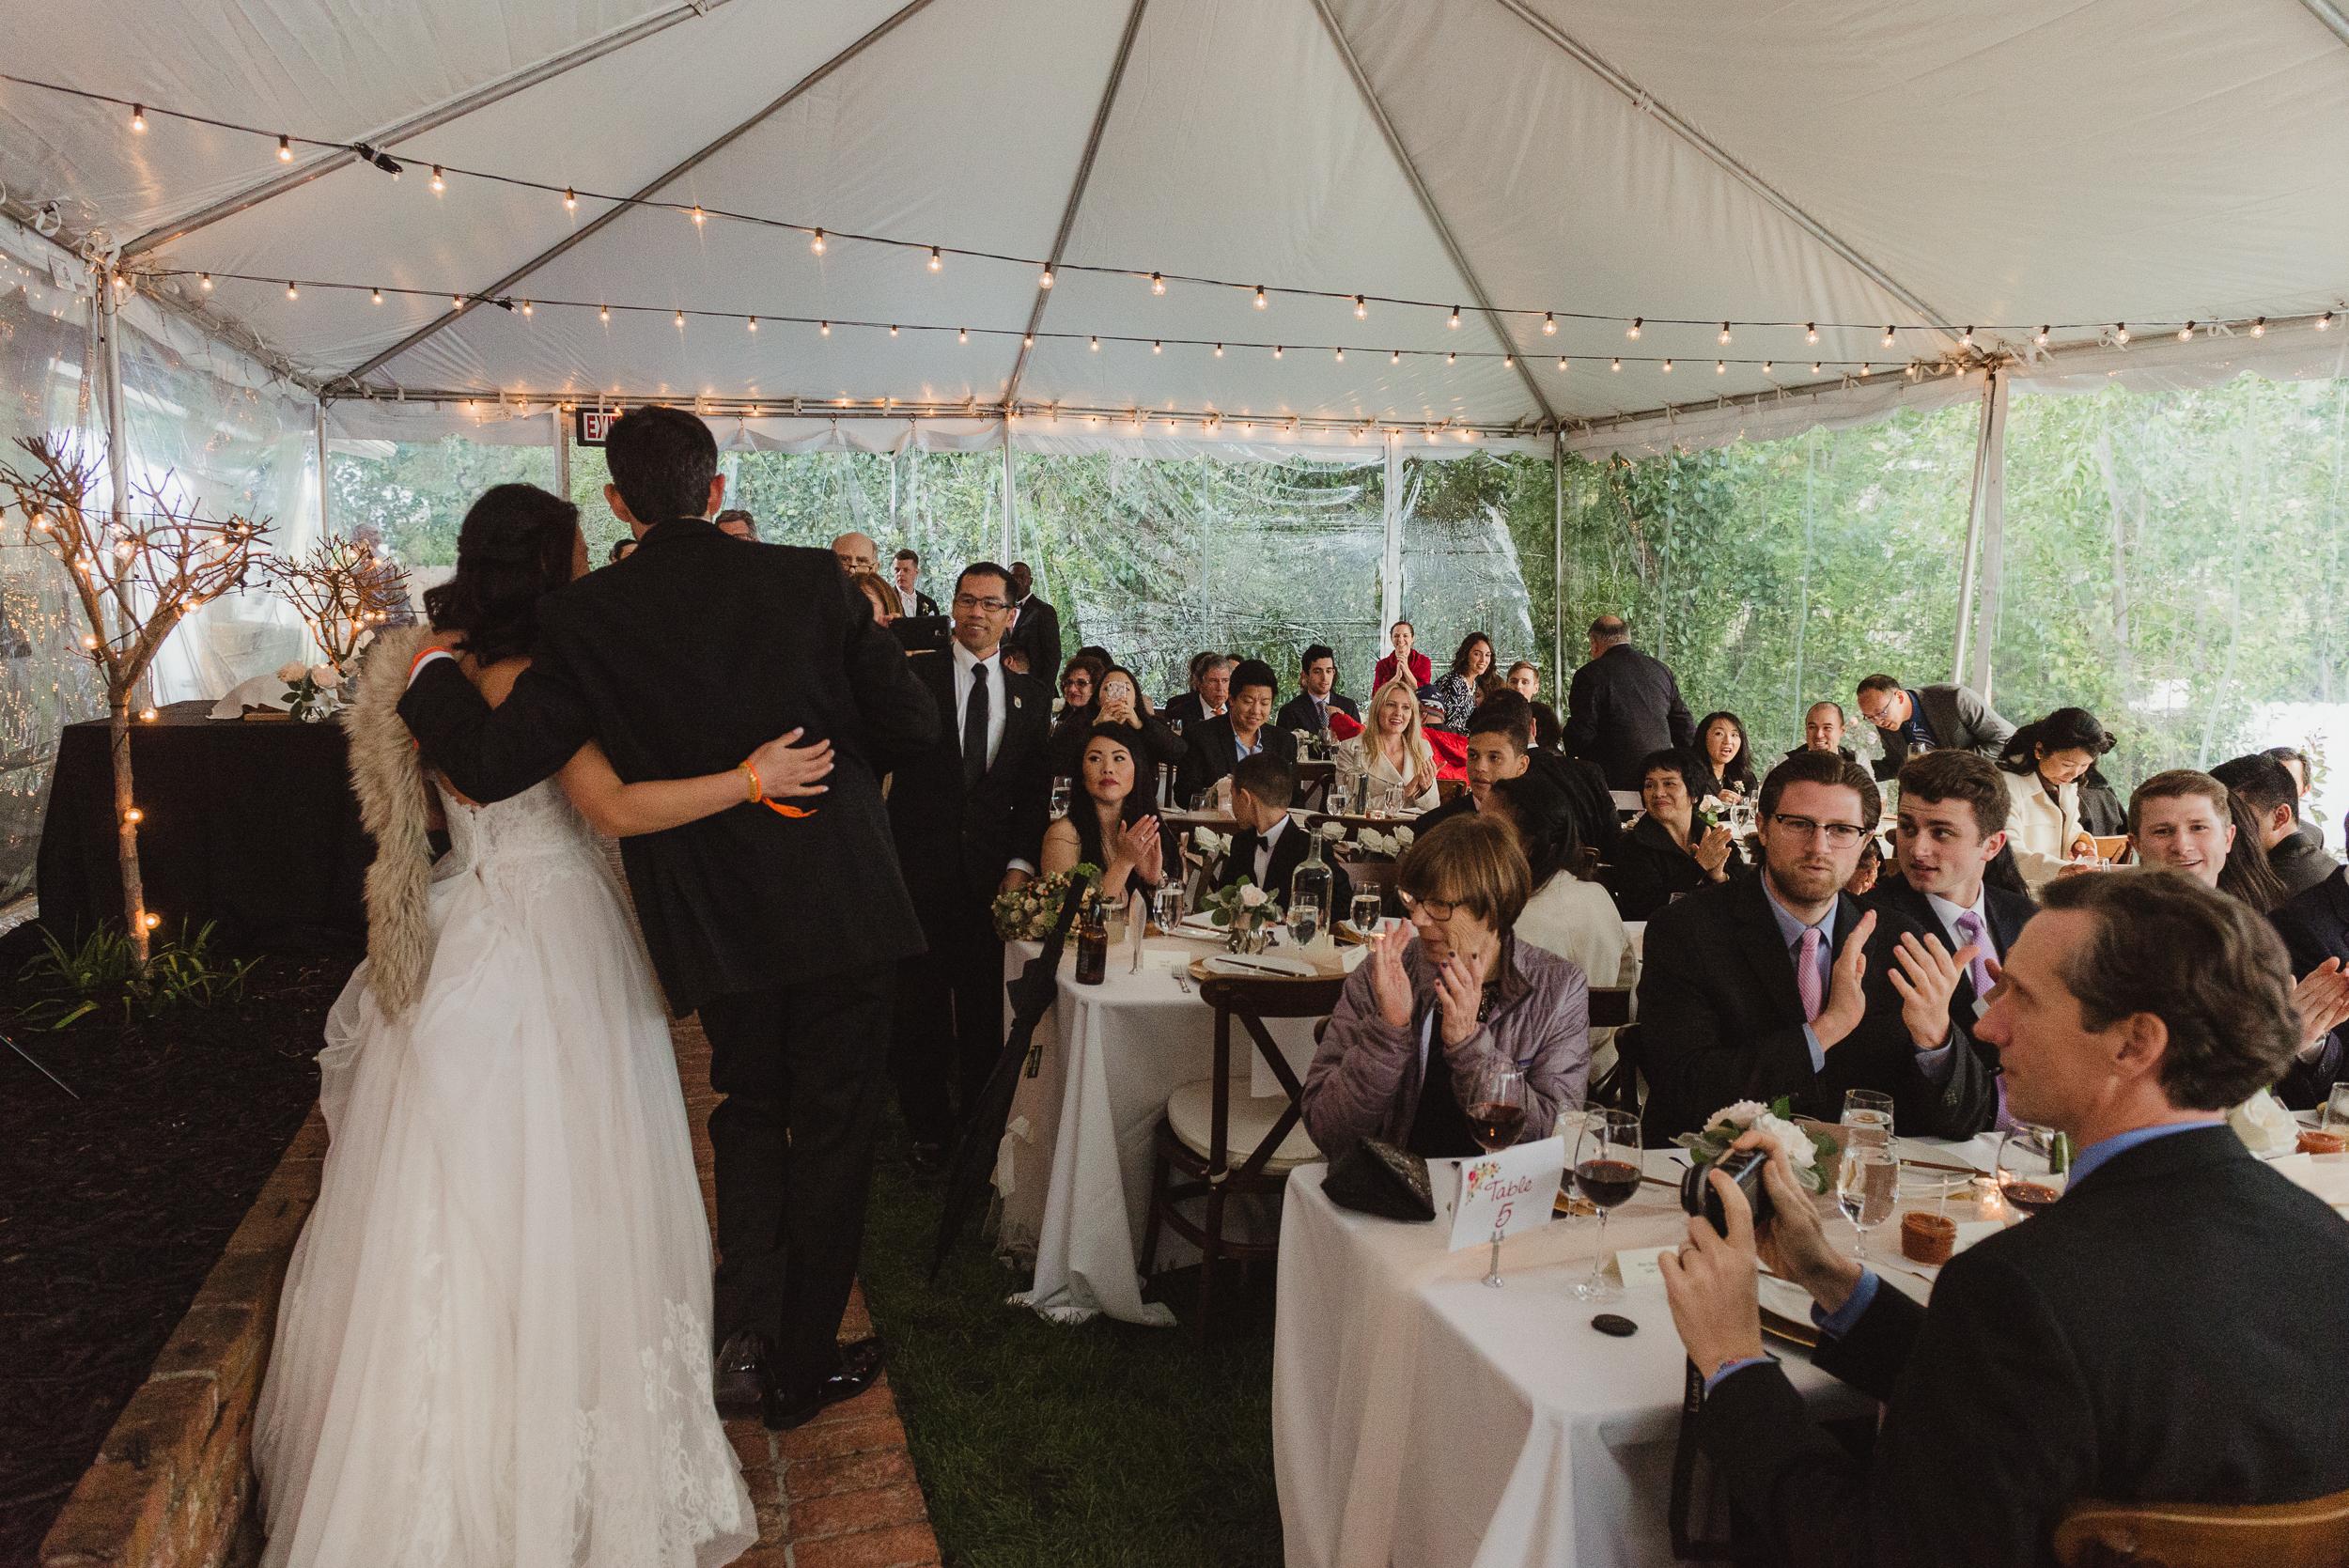 29-woodside-backyard-wedding-vivianchen-0474.jpg